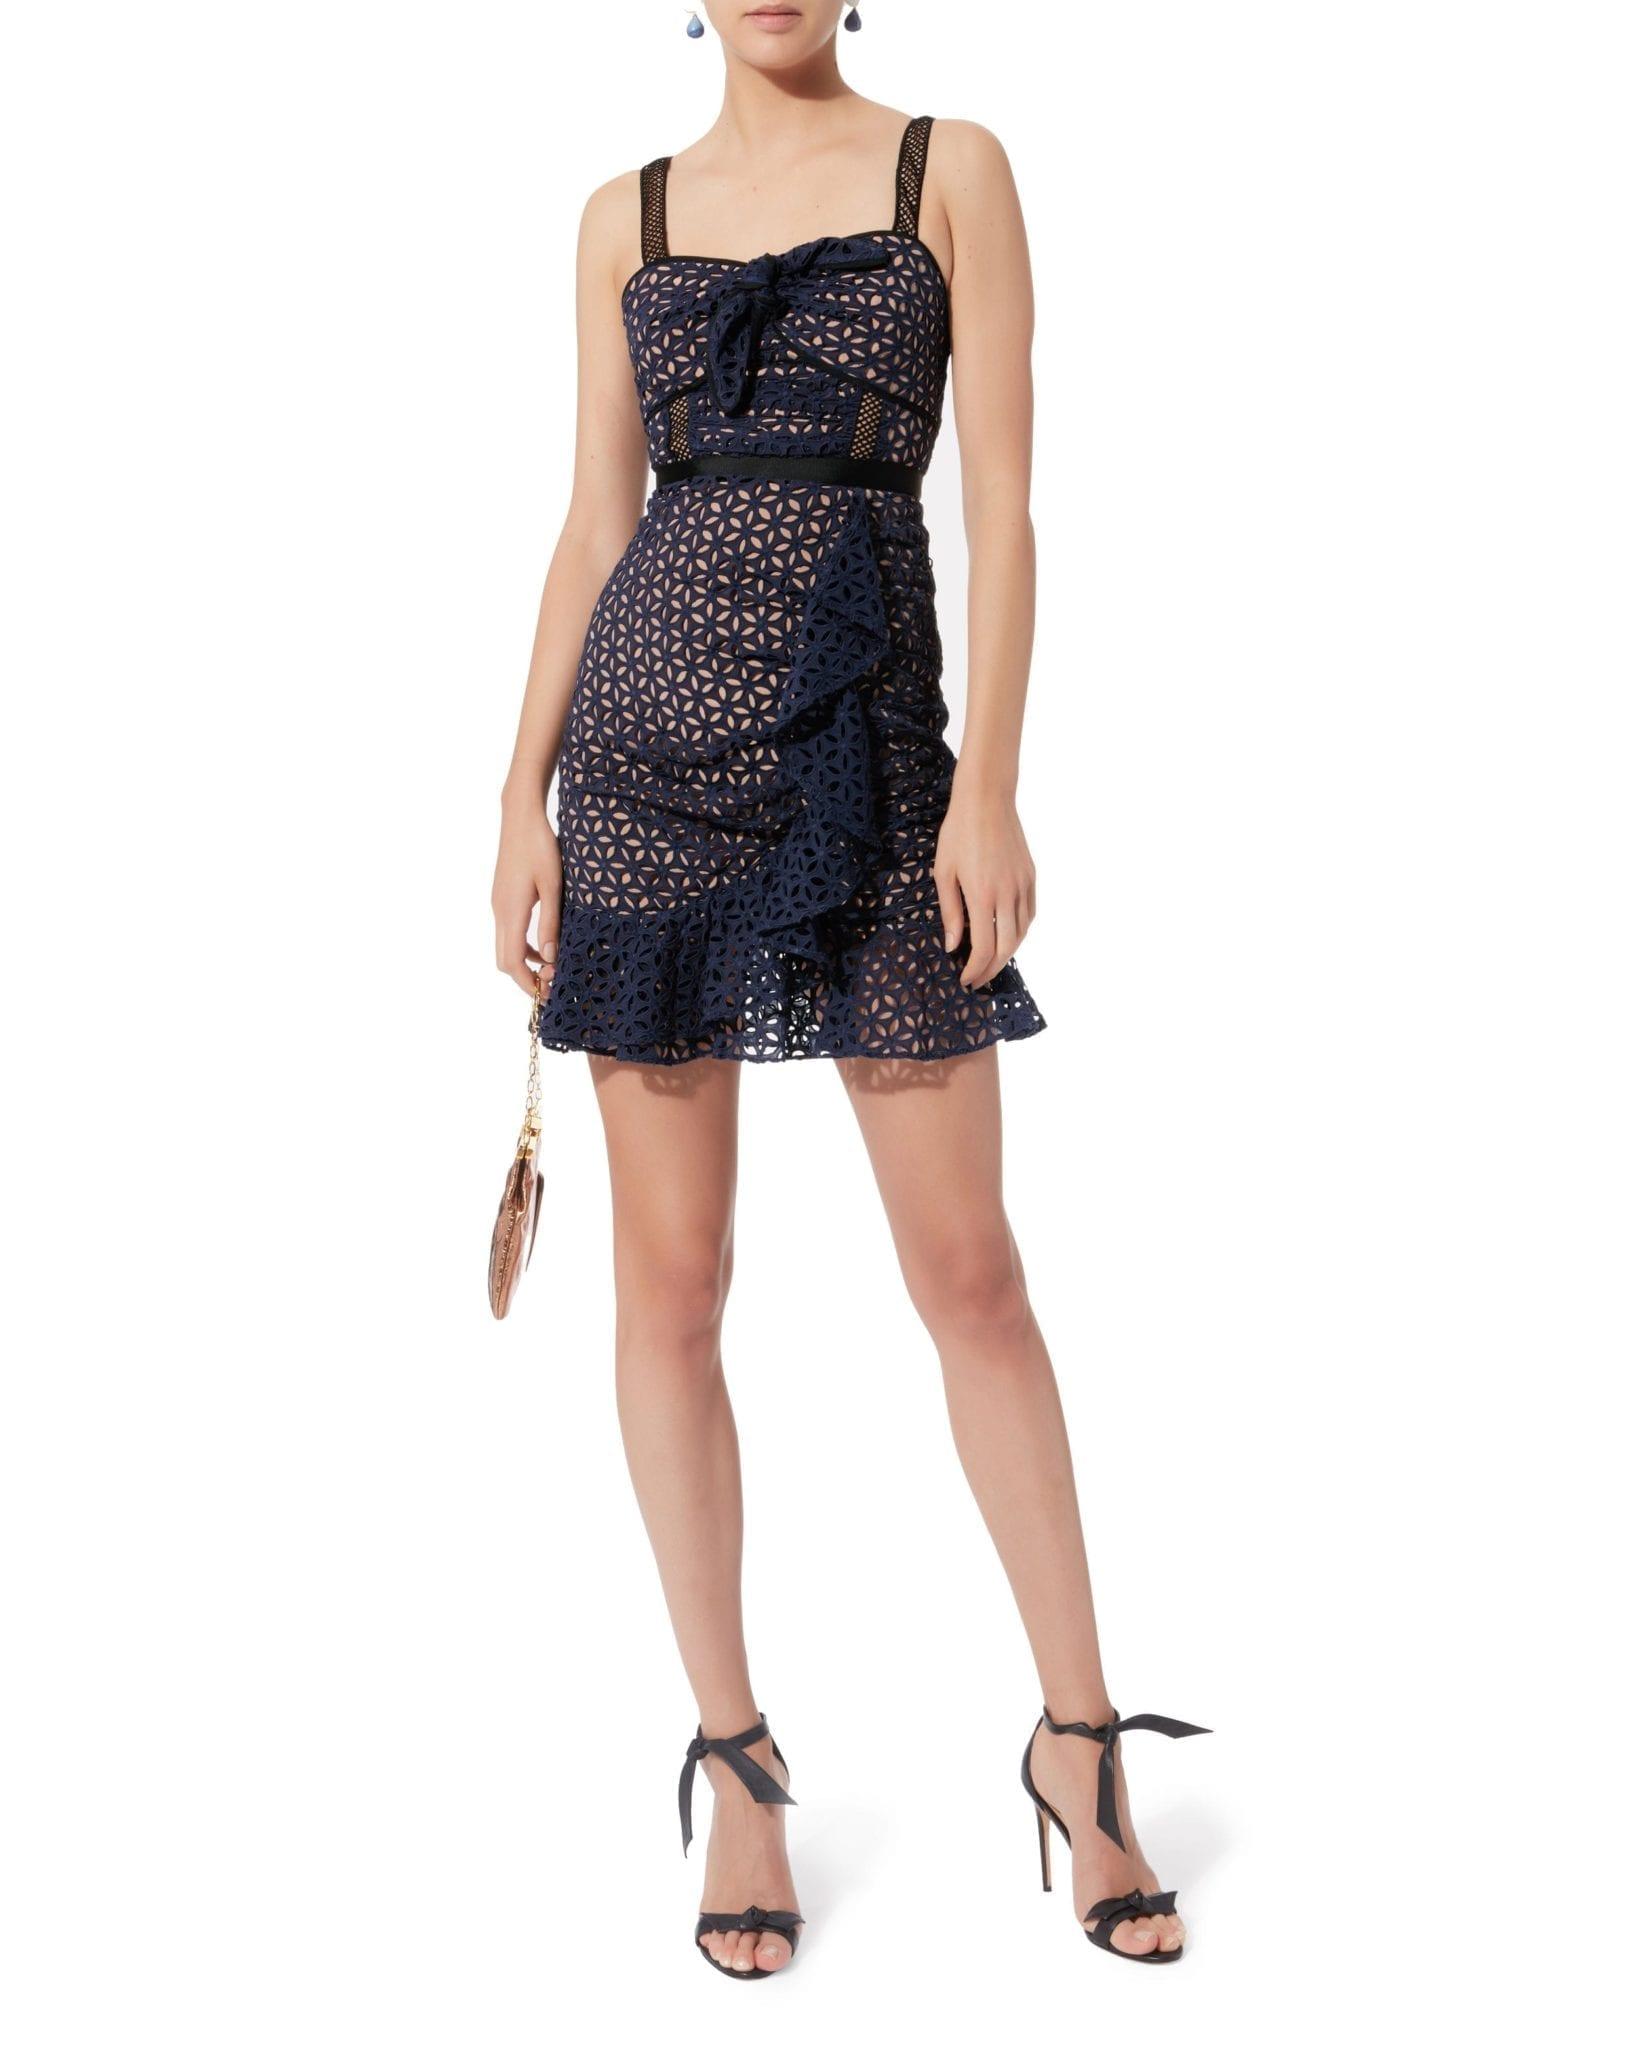 SELF-PORTRAIT Petal Broderie Anglaise Mini Navy Dress